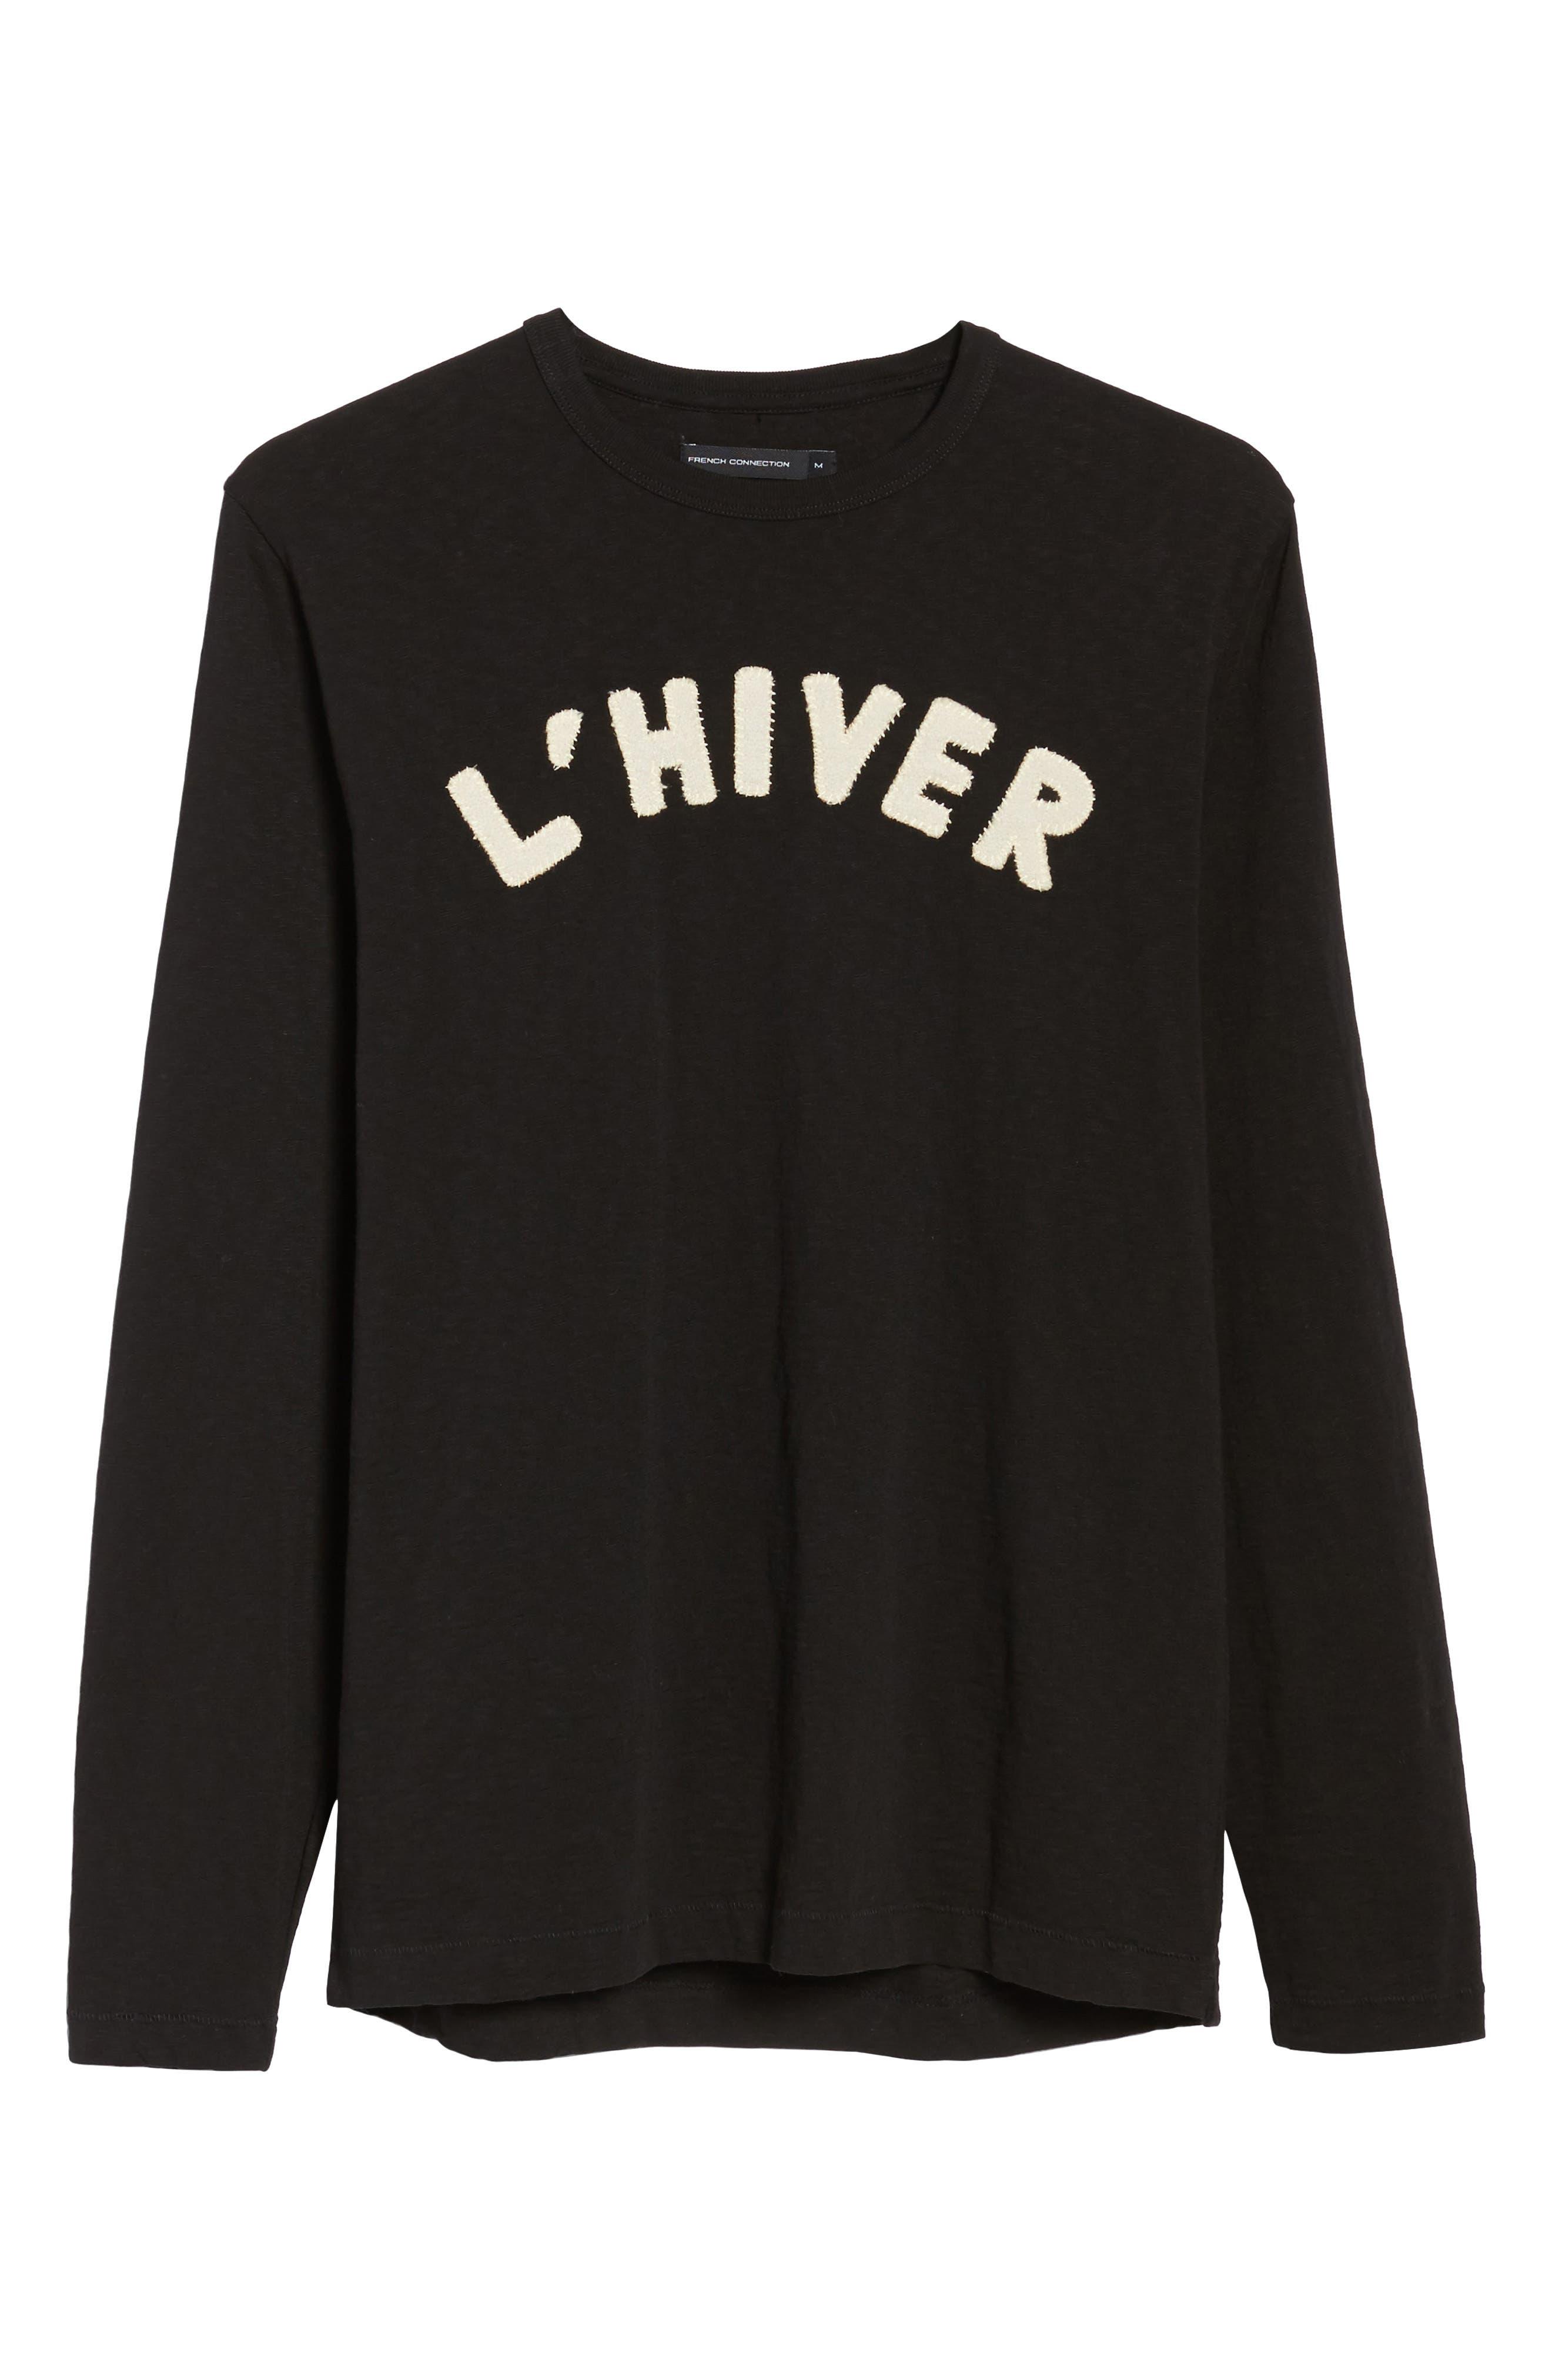 L'Hiver Regular Fit Long Sleeve T-shirt,                             Alternate thumbnail 6, color,                             Black/ Clay